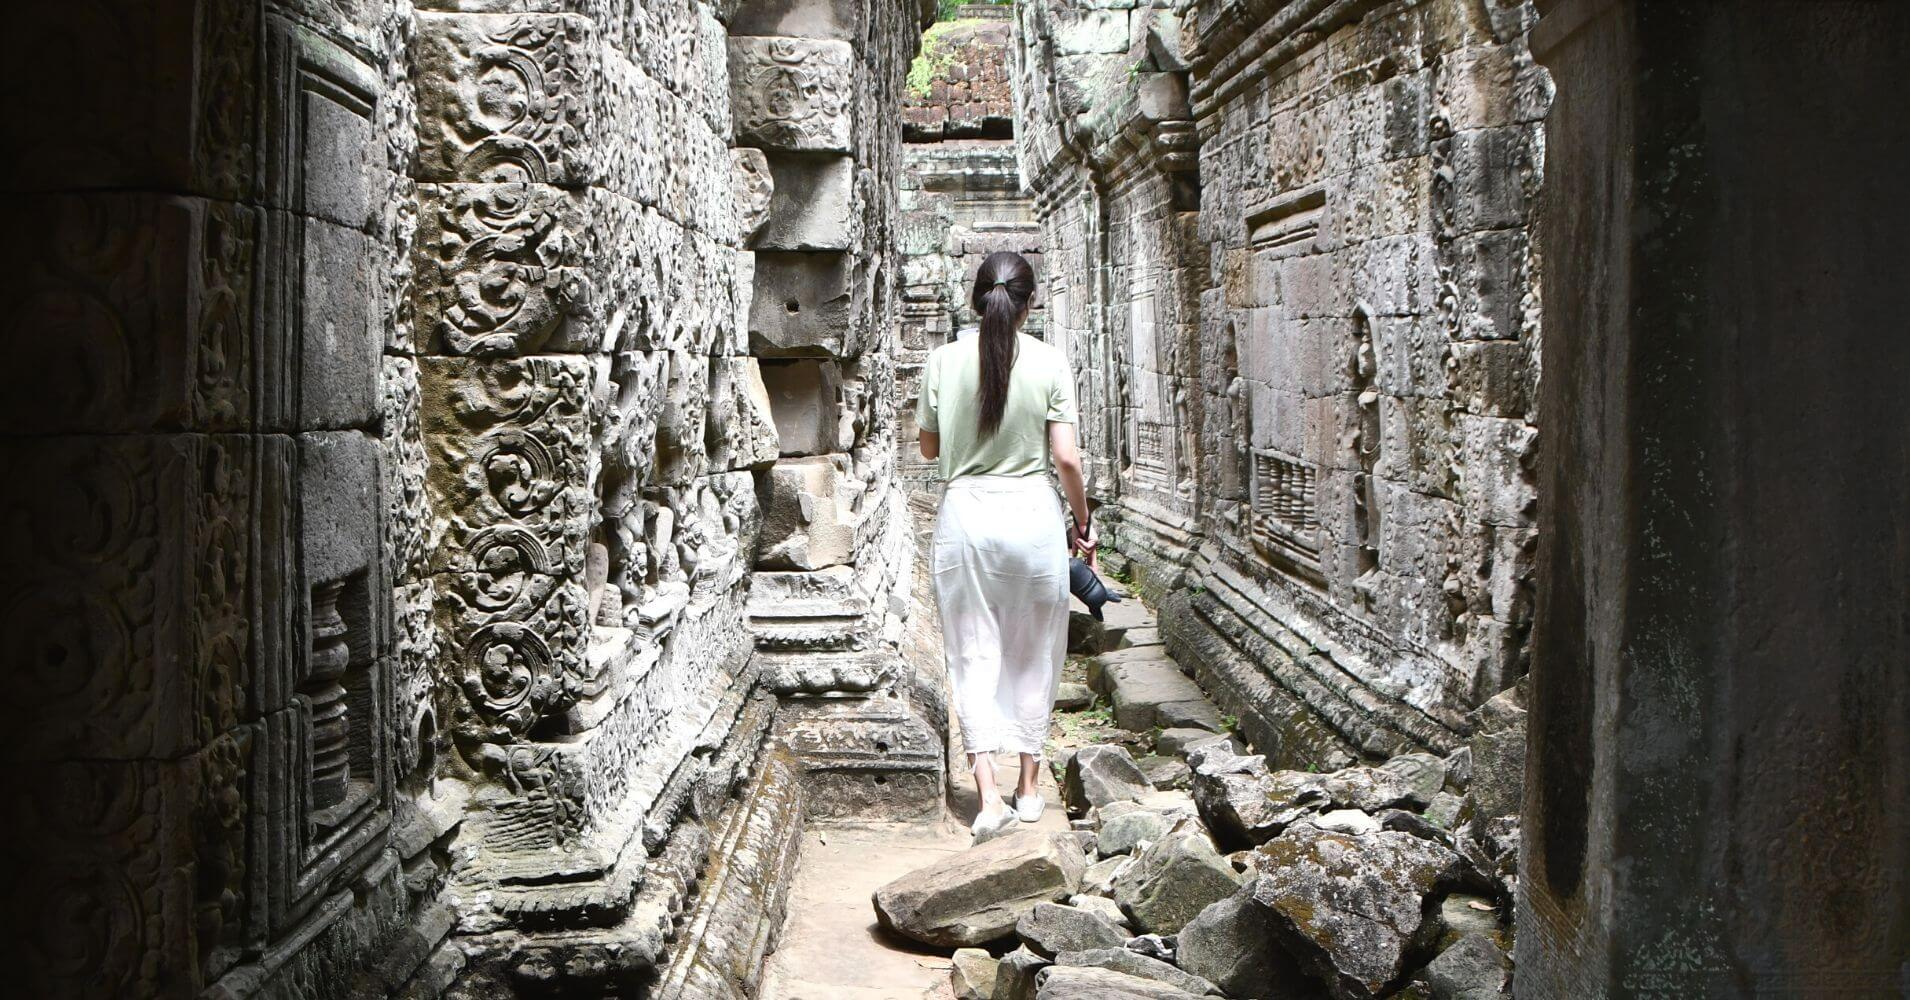 Templo Preah Khan, Templo de la Espada Sagrada. Siem Reap. Camboya.